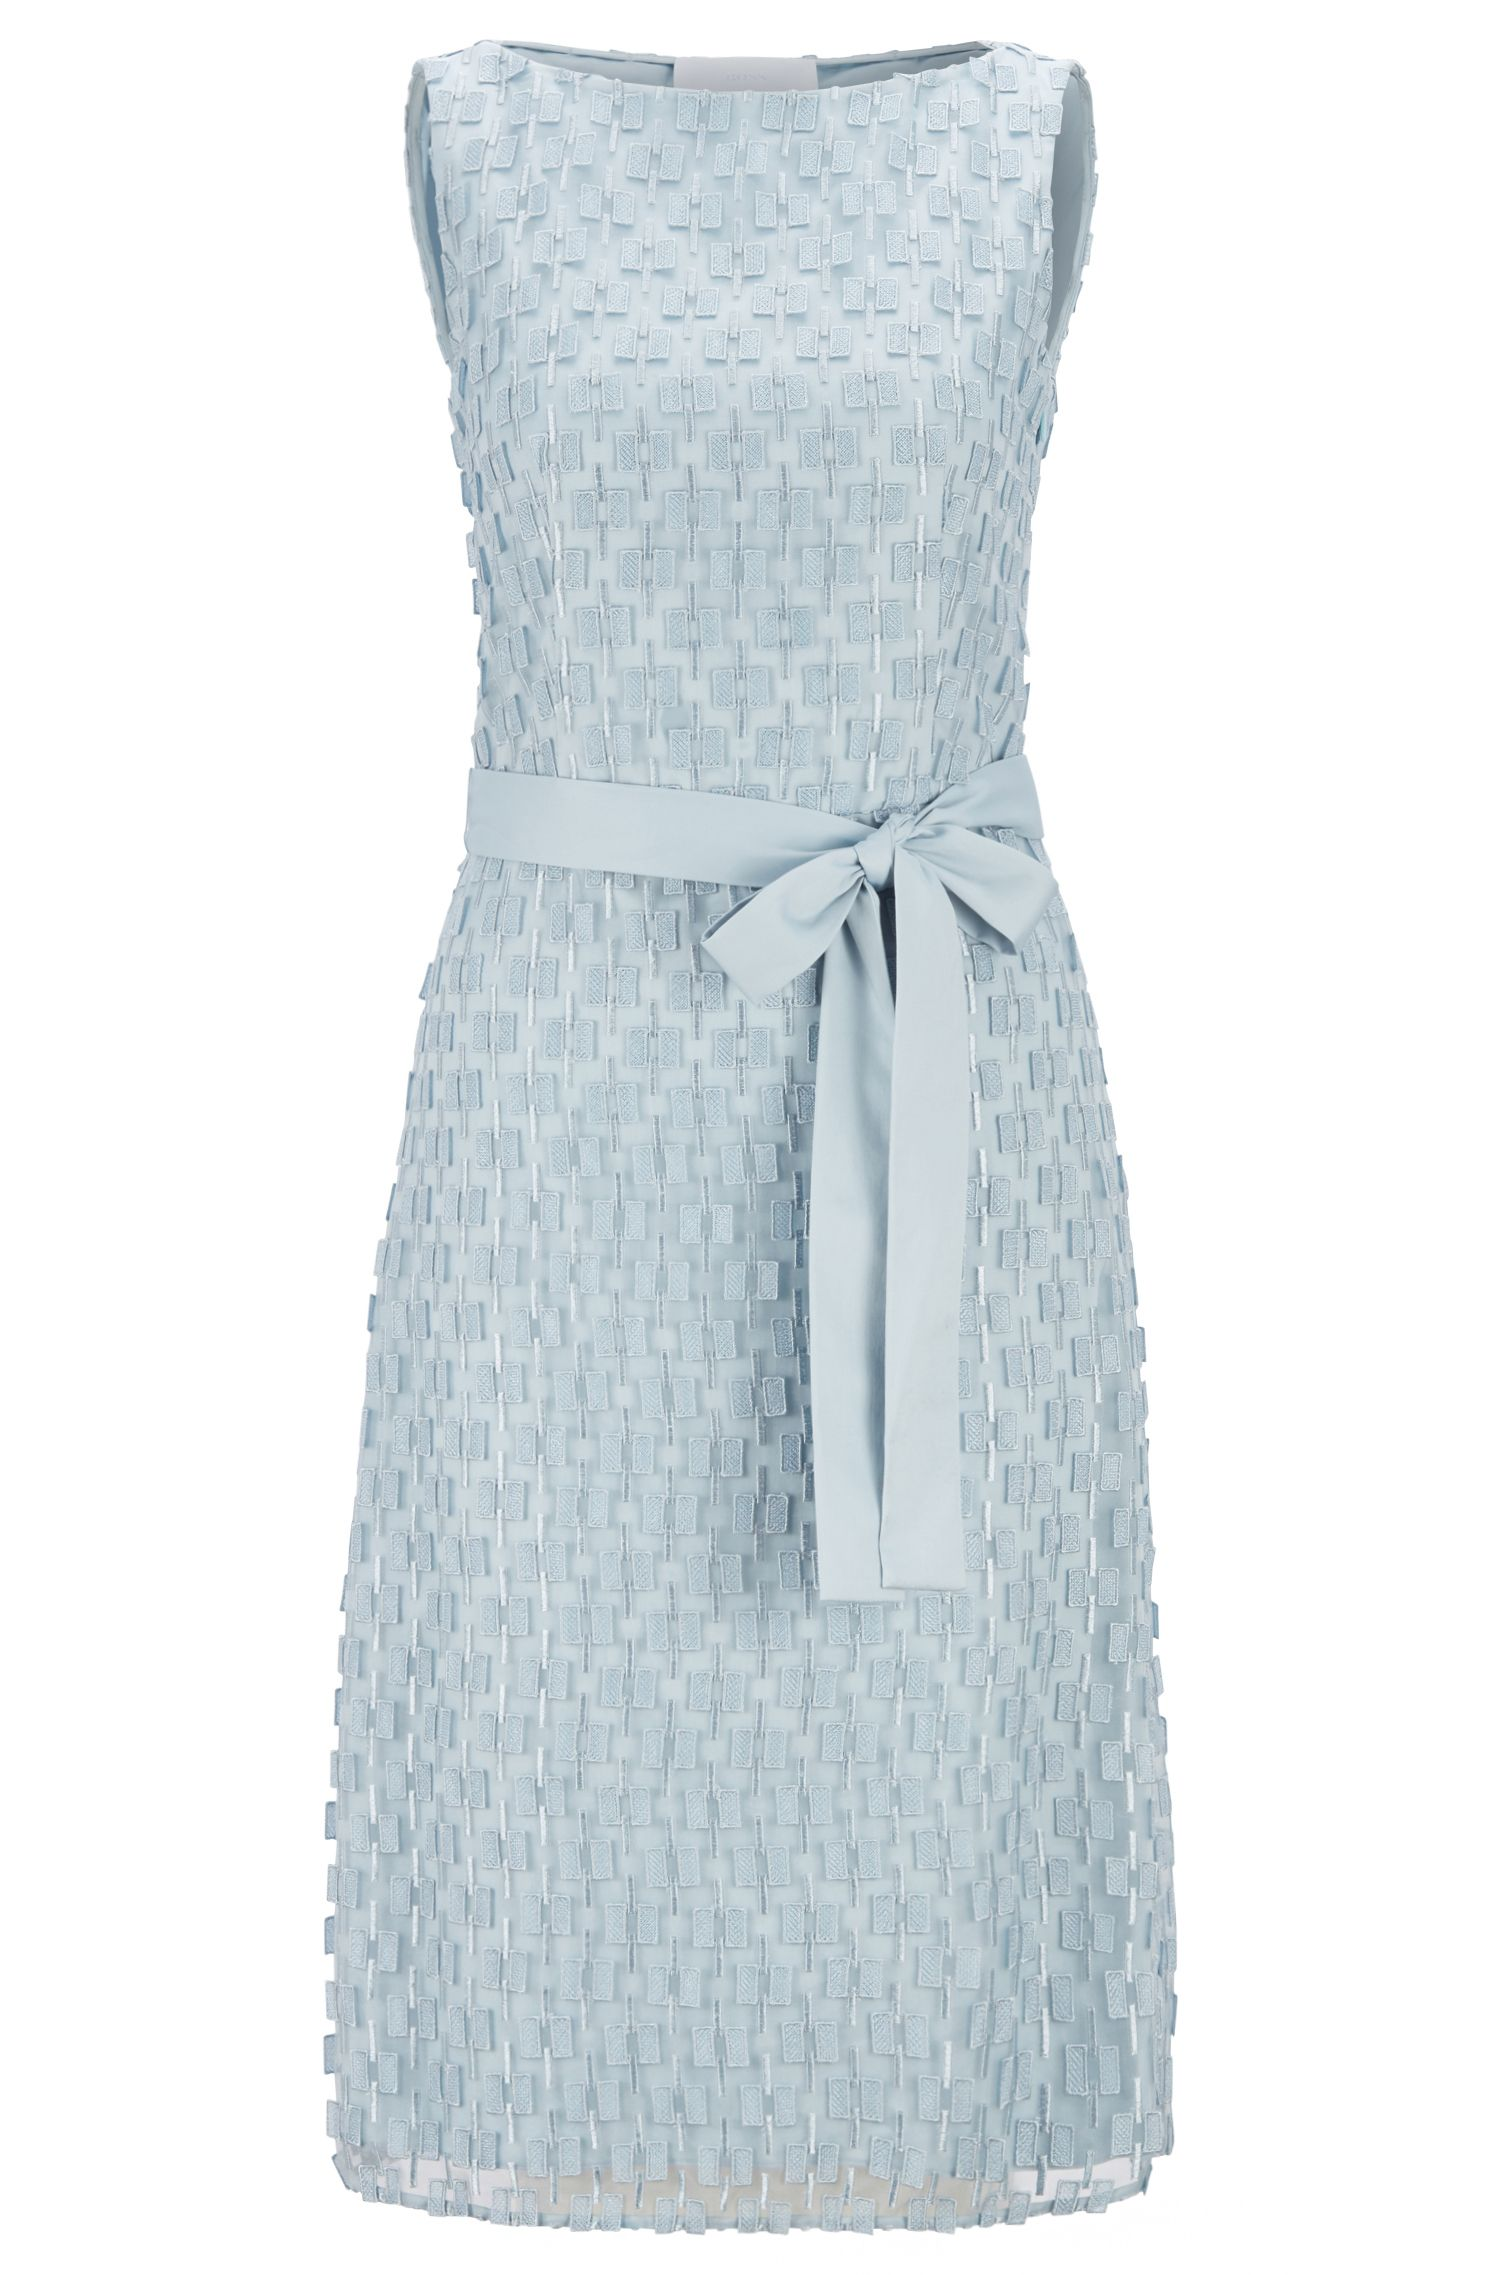 Robe Regular Fit en dentelle brodée avec ceinture à nouer, Bleu vif